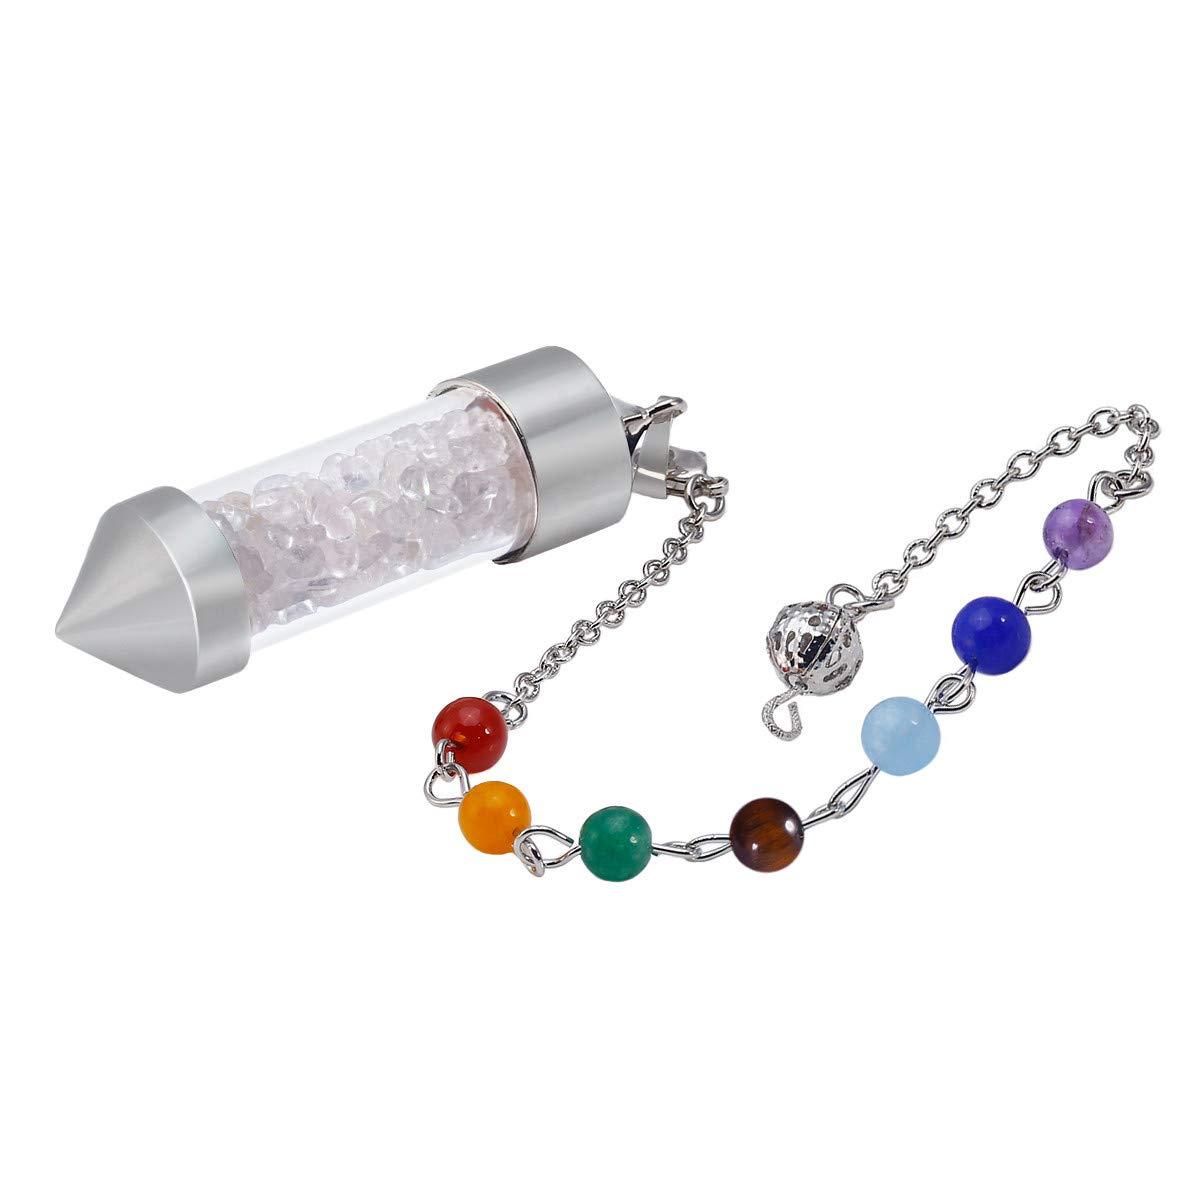 TUMBEELLUWA Healing Stone Chip 7 Chakra Pendulum Crystal Pendant Wish Bottle Necklace Dowsing Amulet